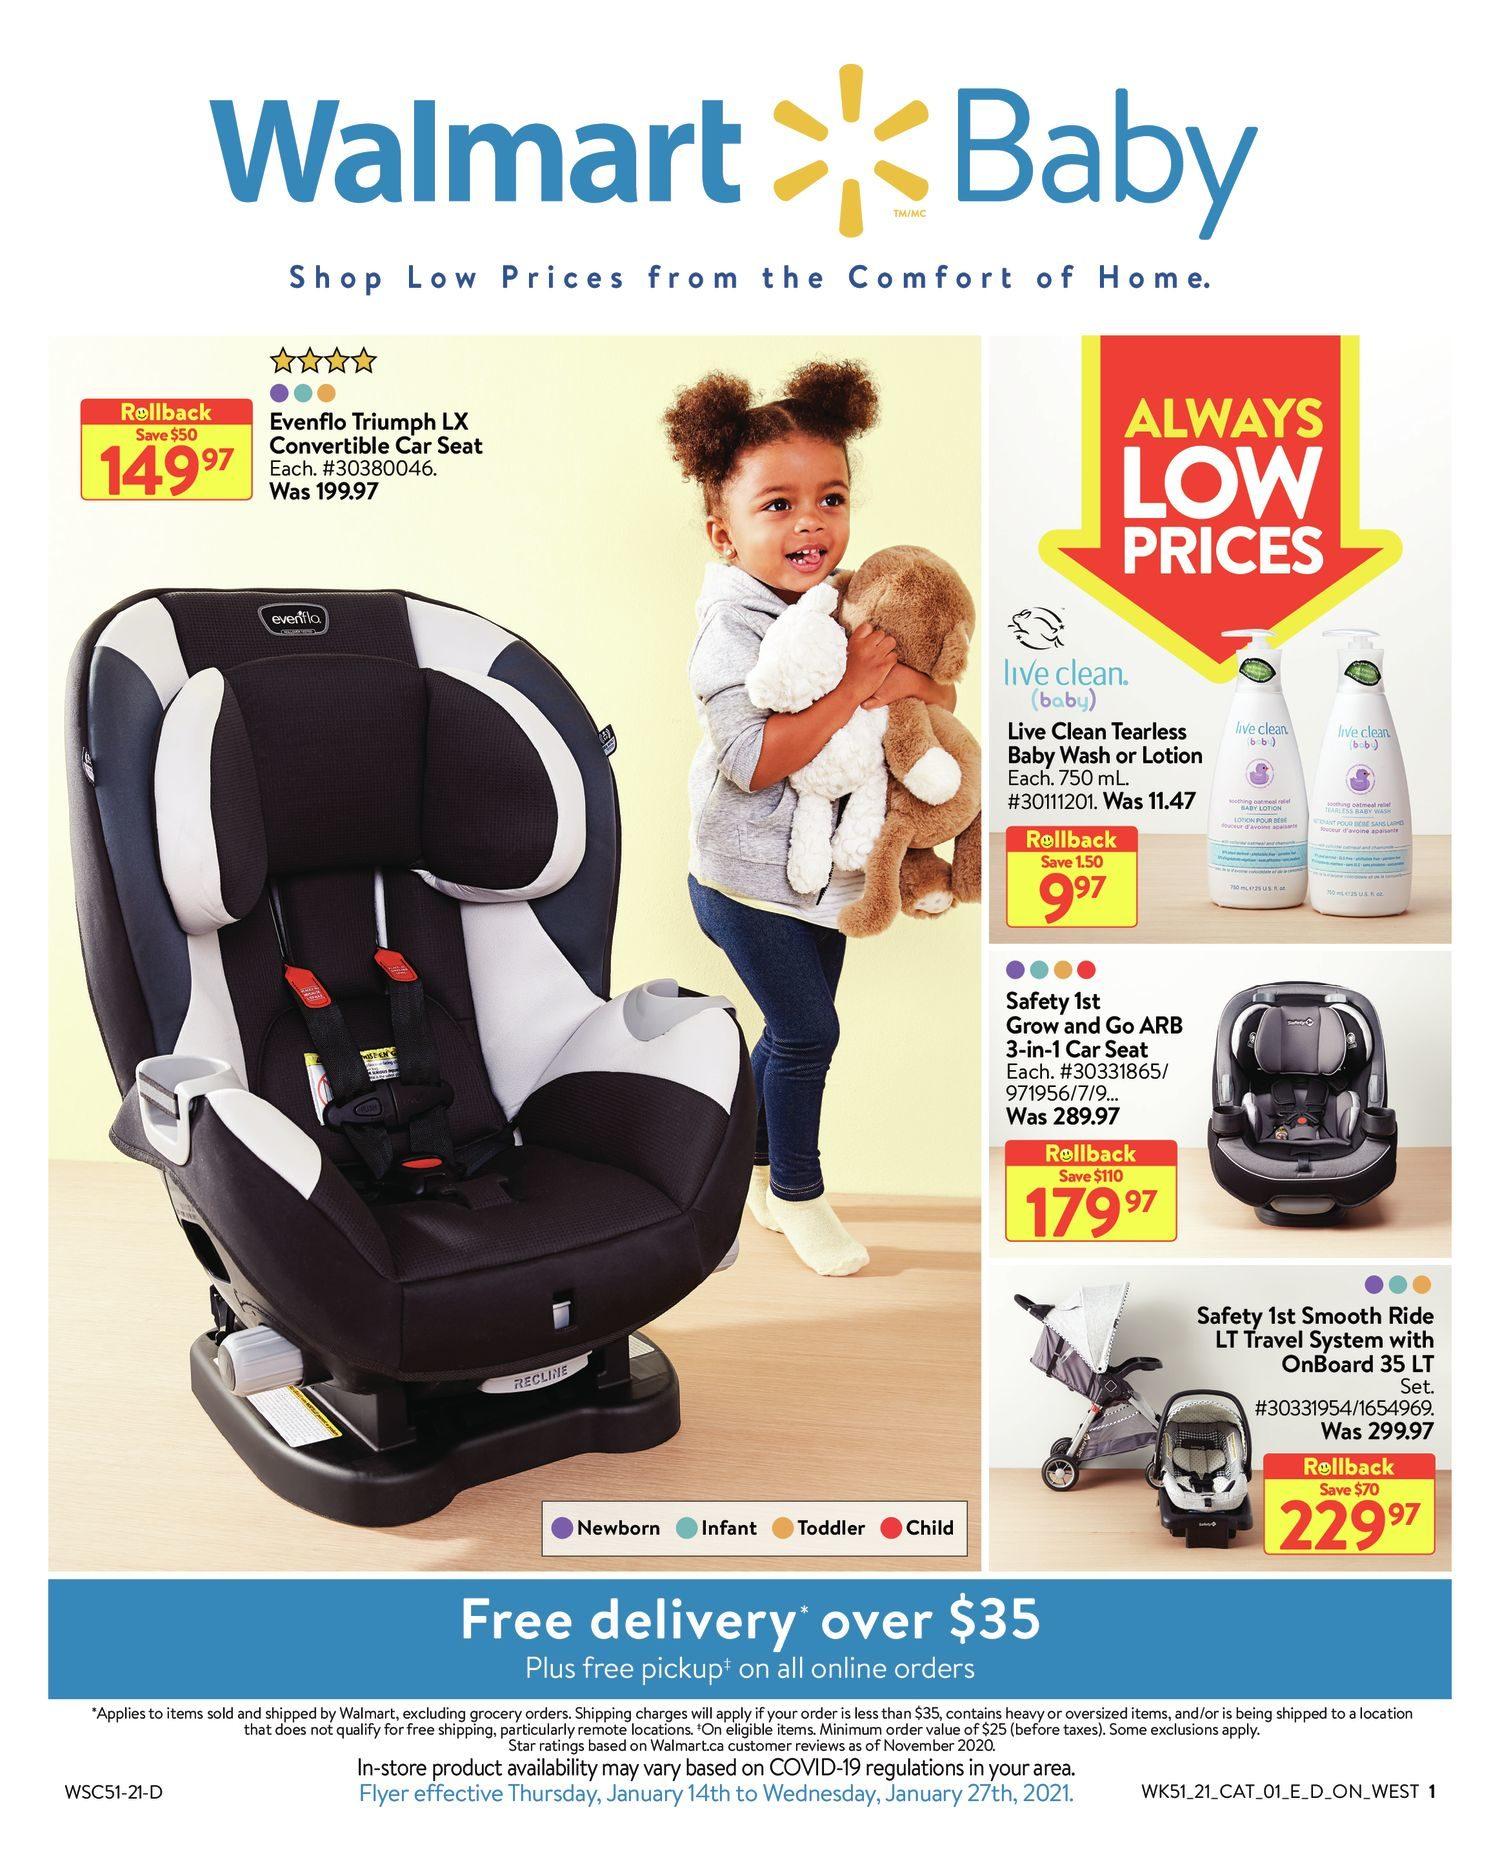 Walmart - Baby Book